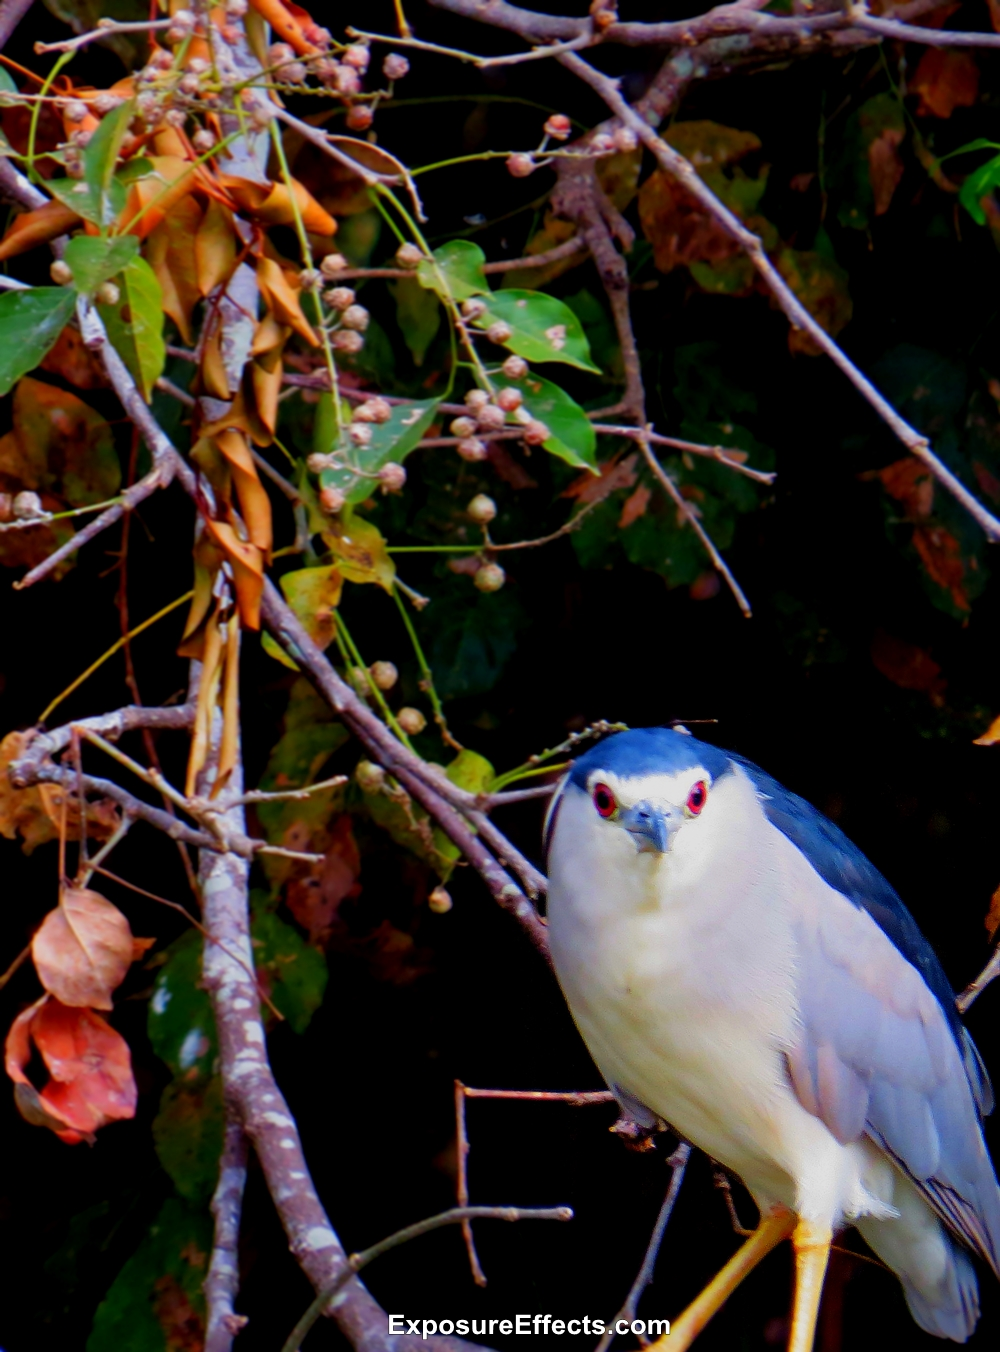 Ranganathittu Bird Sanctuary - Karnataka India